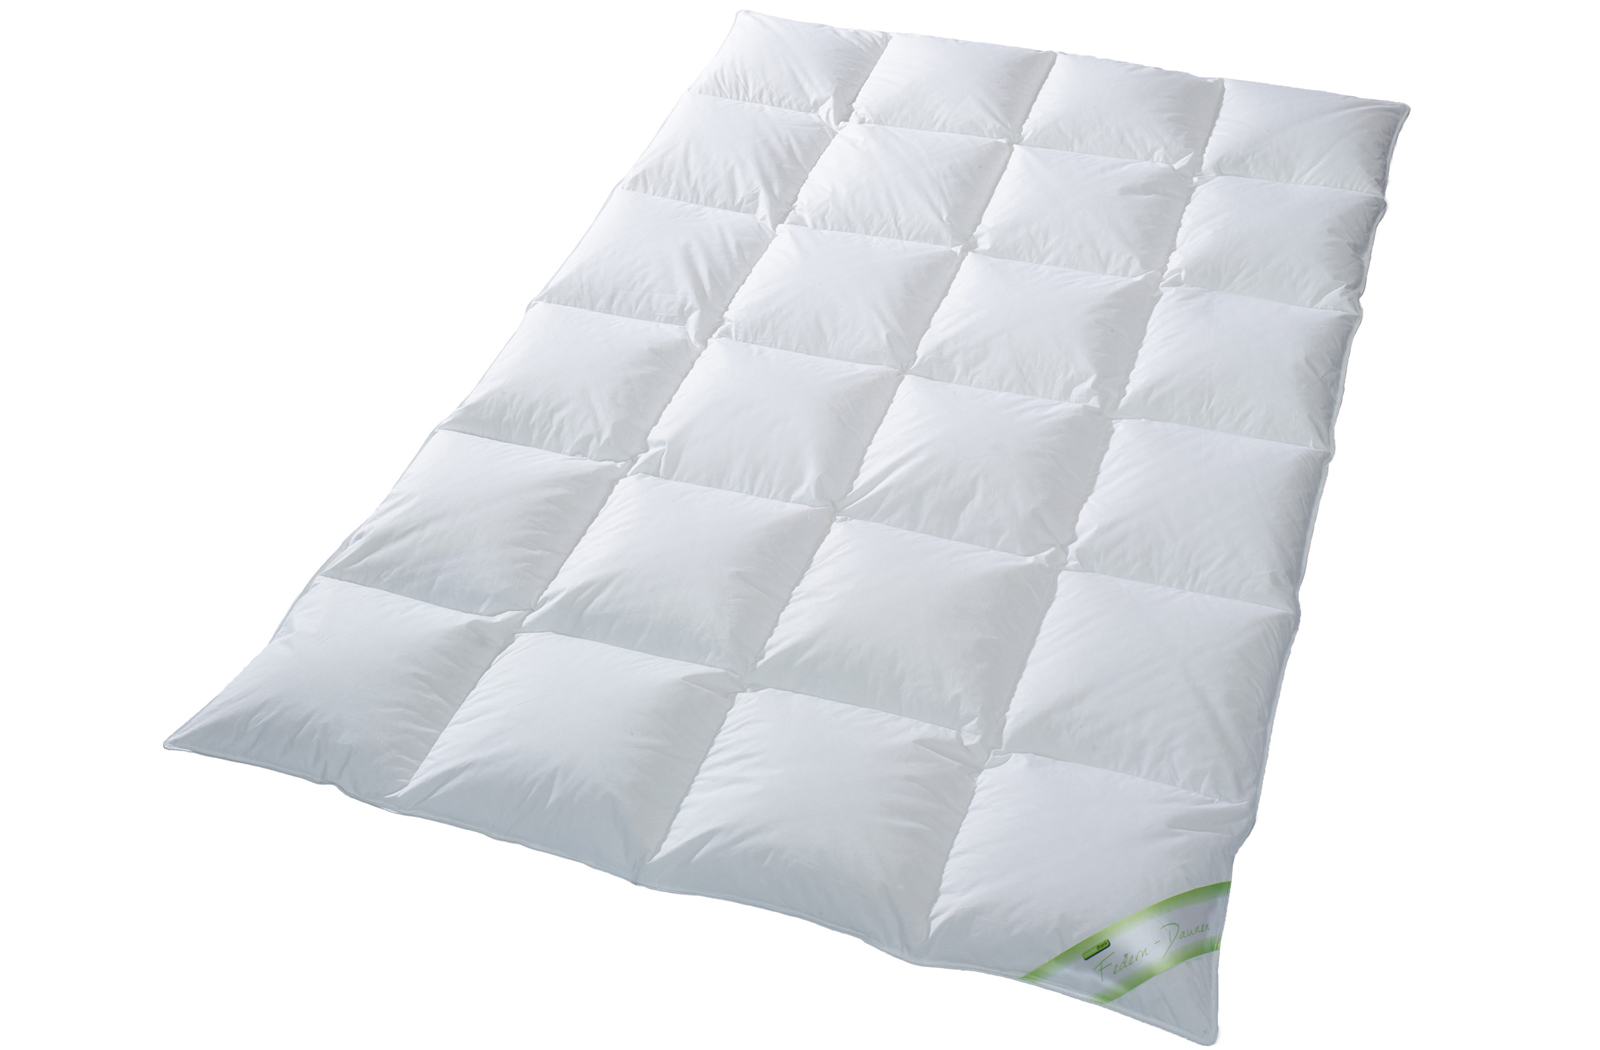 Kinder Daunendecke Bettdecke Baby Decke 100x135 100 Gänse Daunen Kai